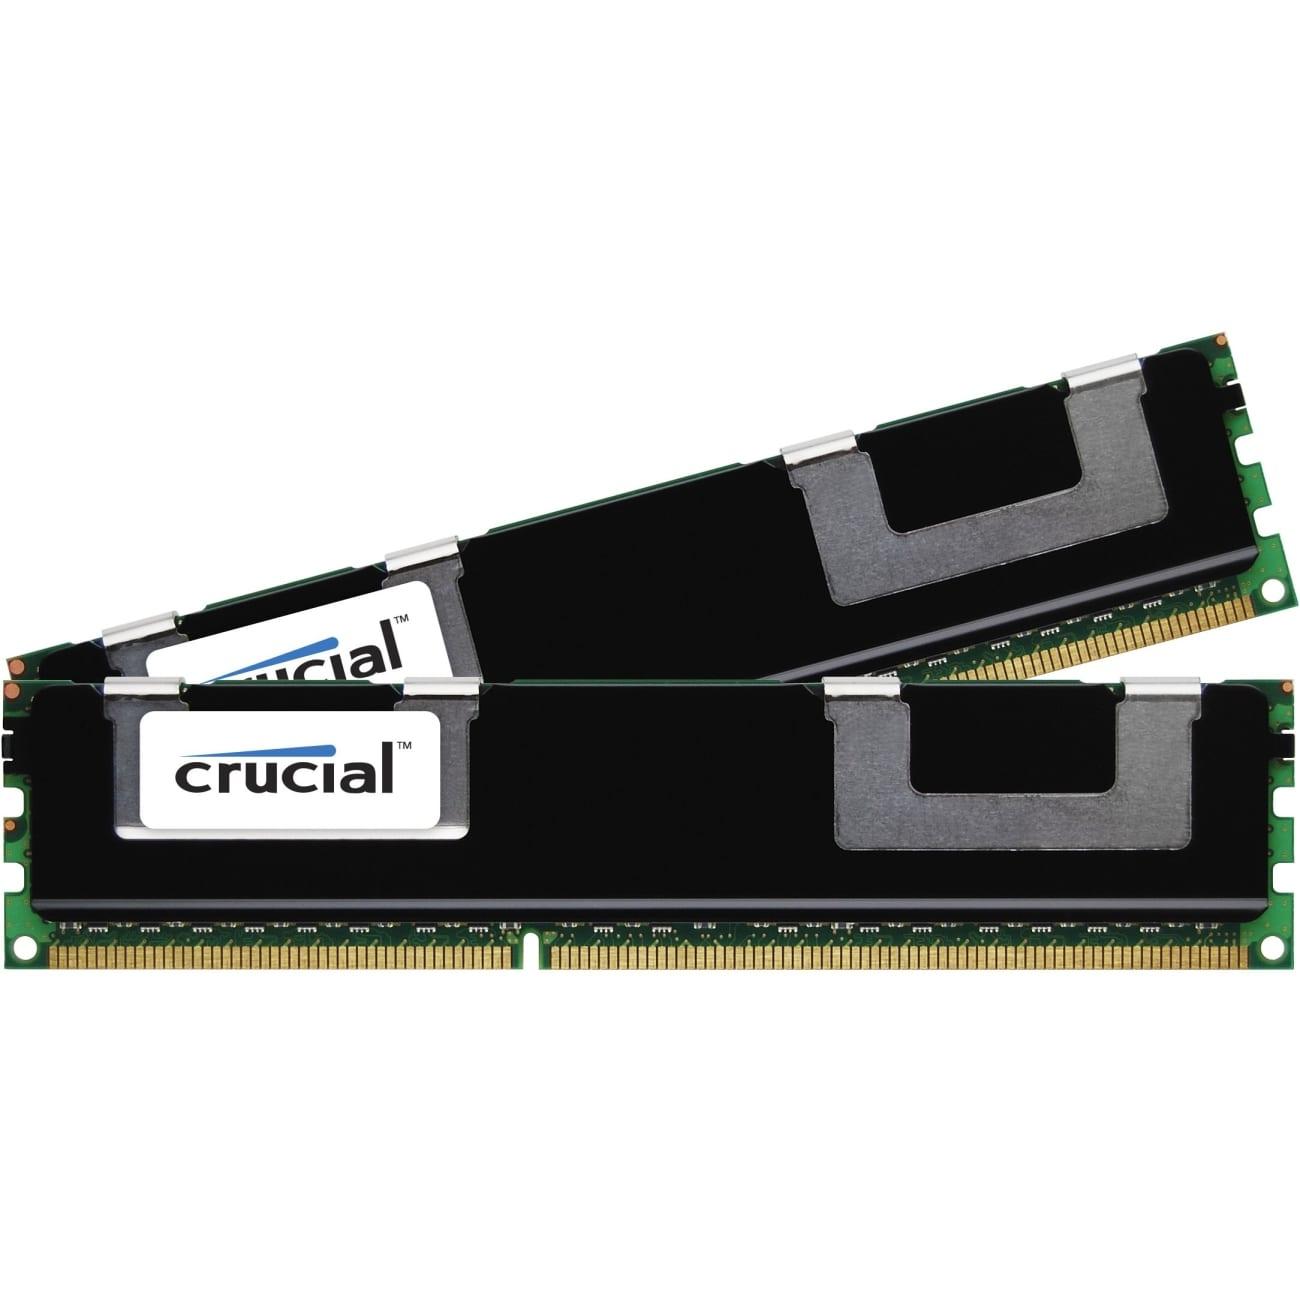 Crucial 16GB kit (2x8GB) 1600MHz DDR3L RDIMM Memory